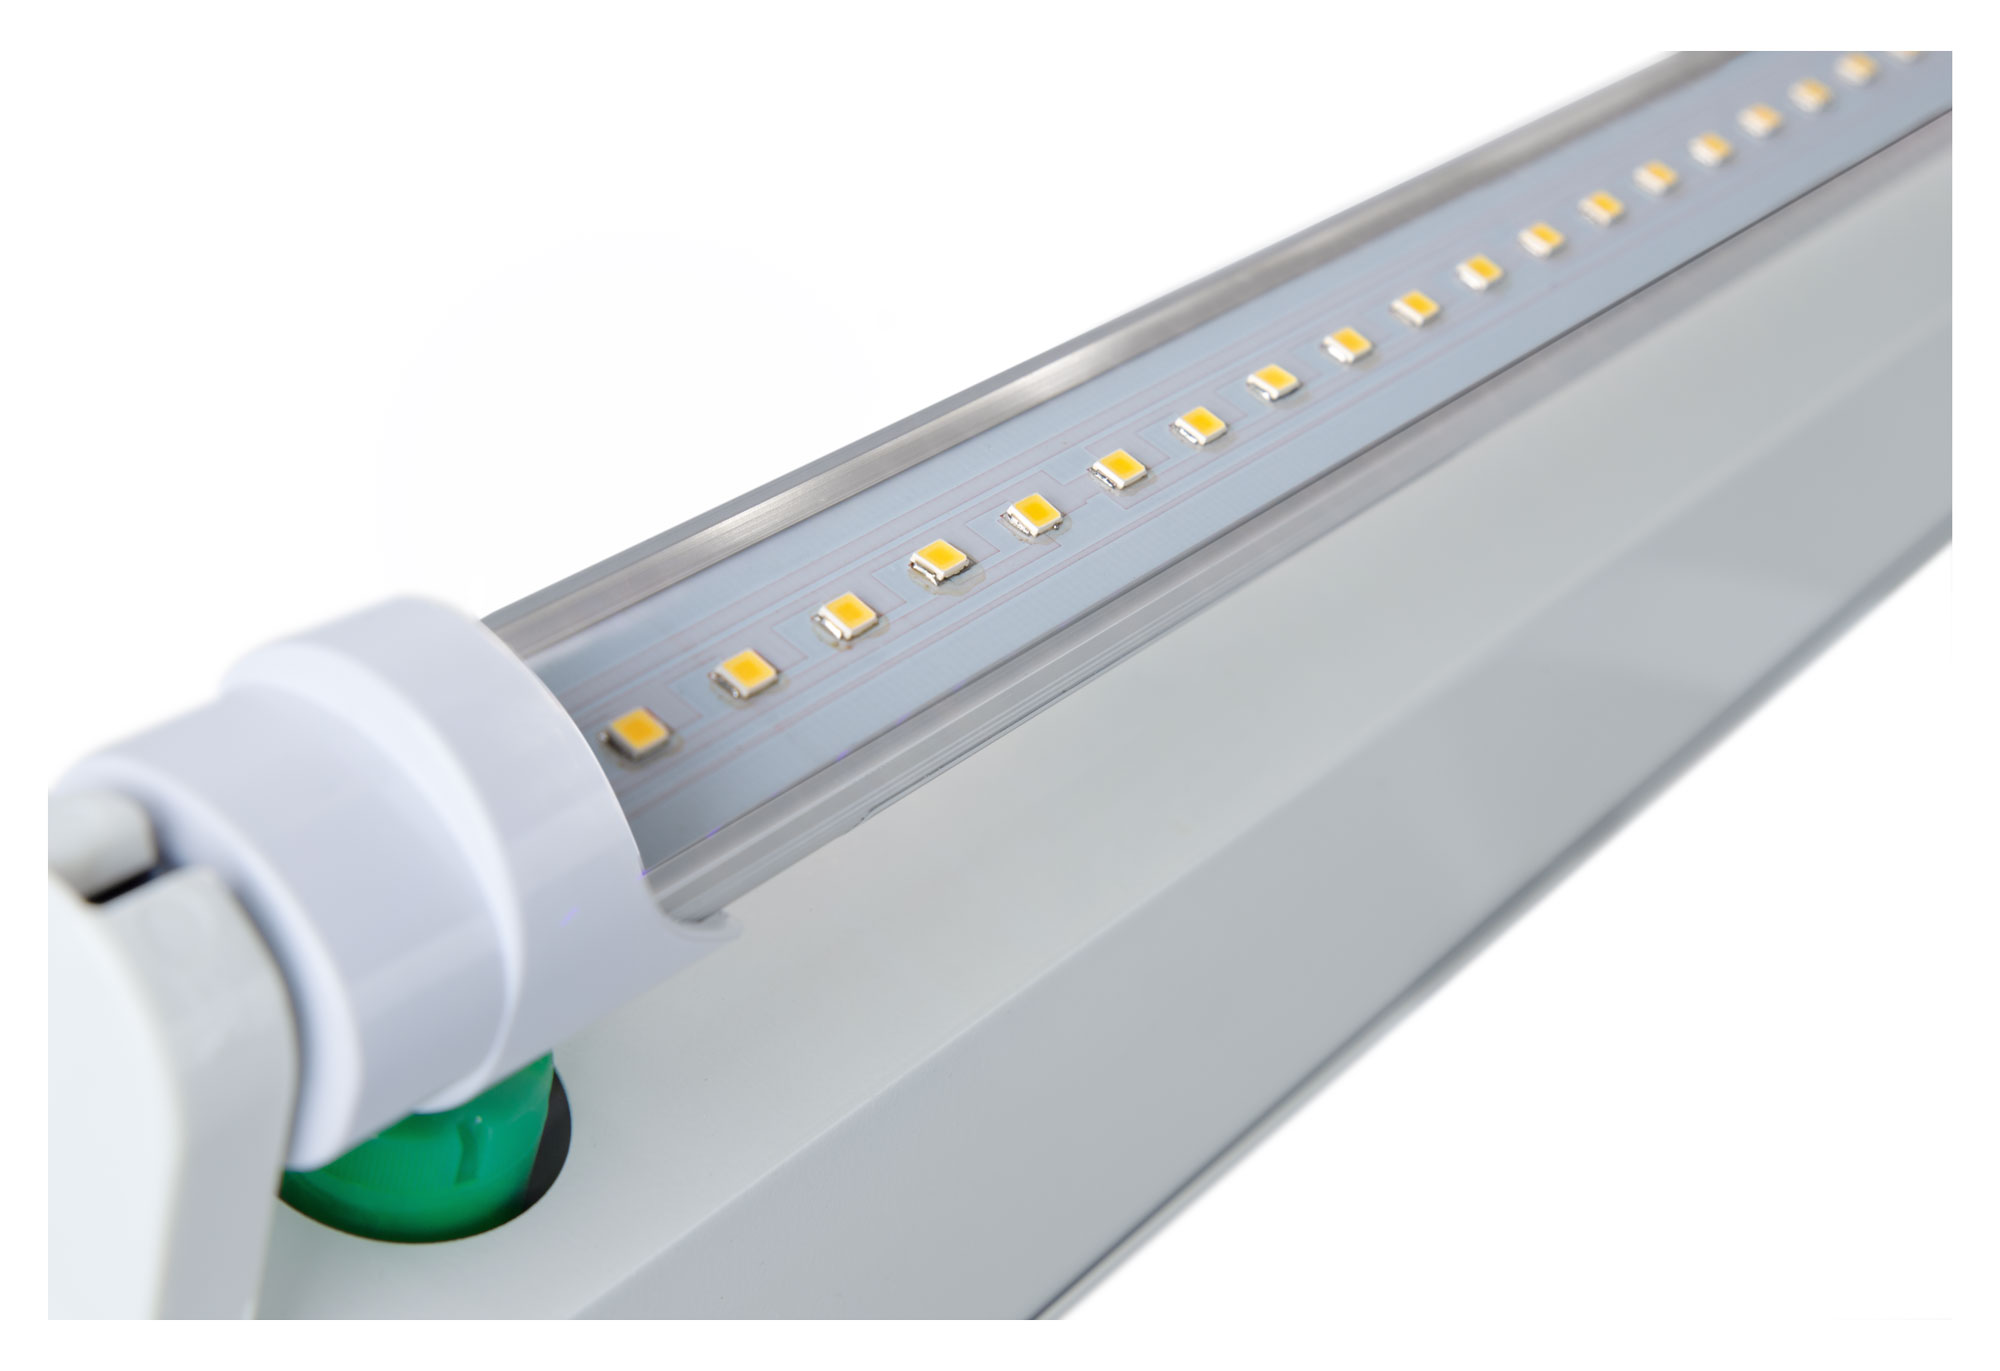 Plafoniera Con Tubo Led : Tubo led showlite 1500mm set di 2